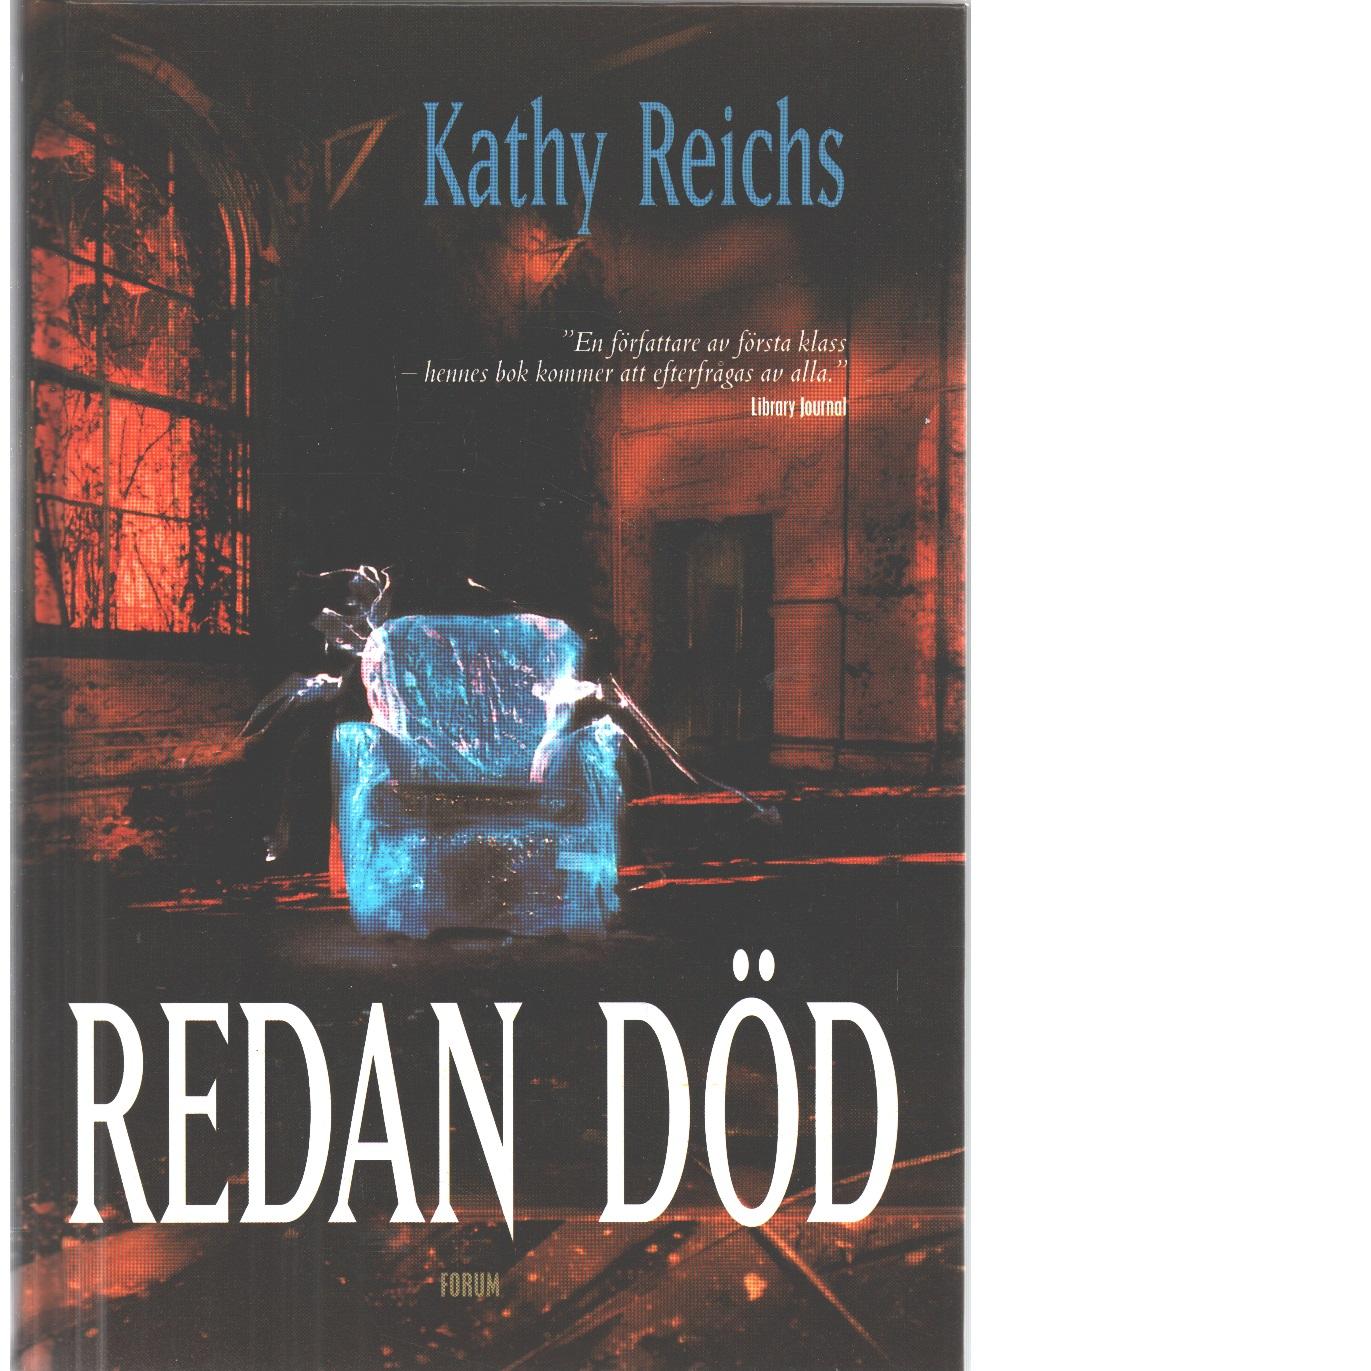 Redan död - Reichs, Kathy